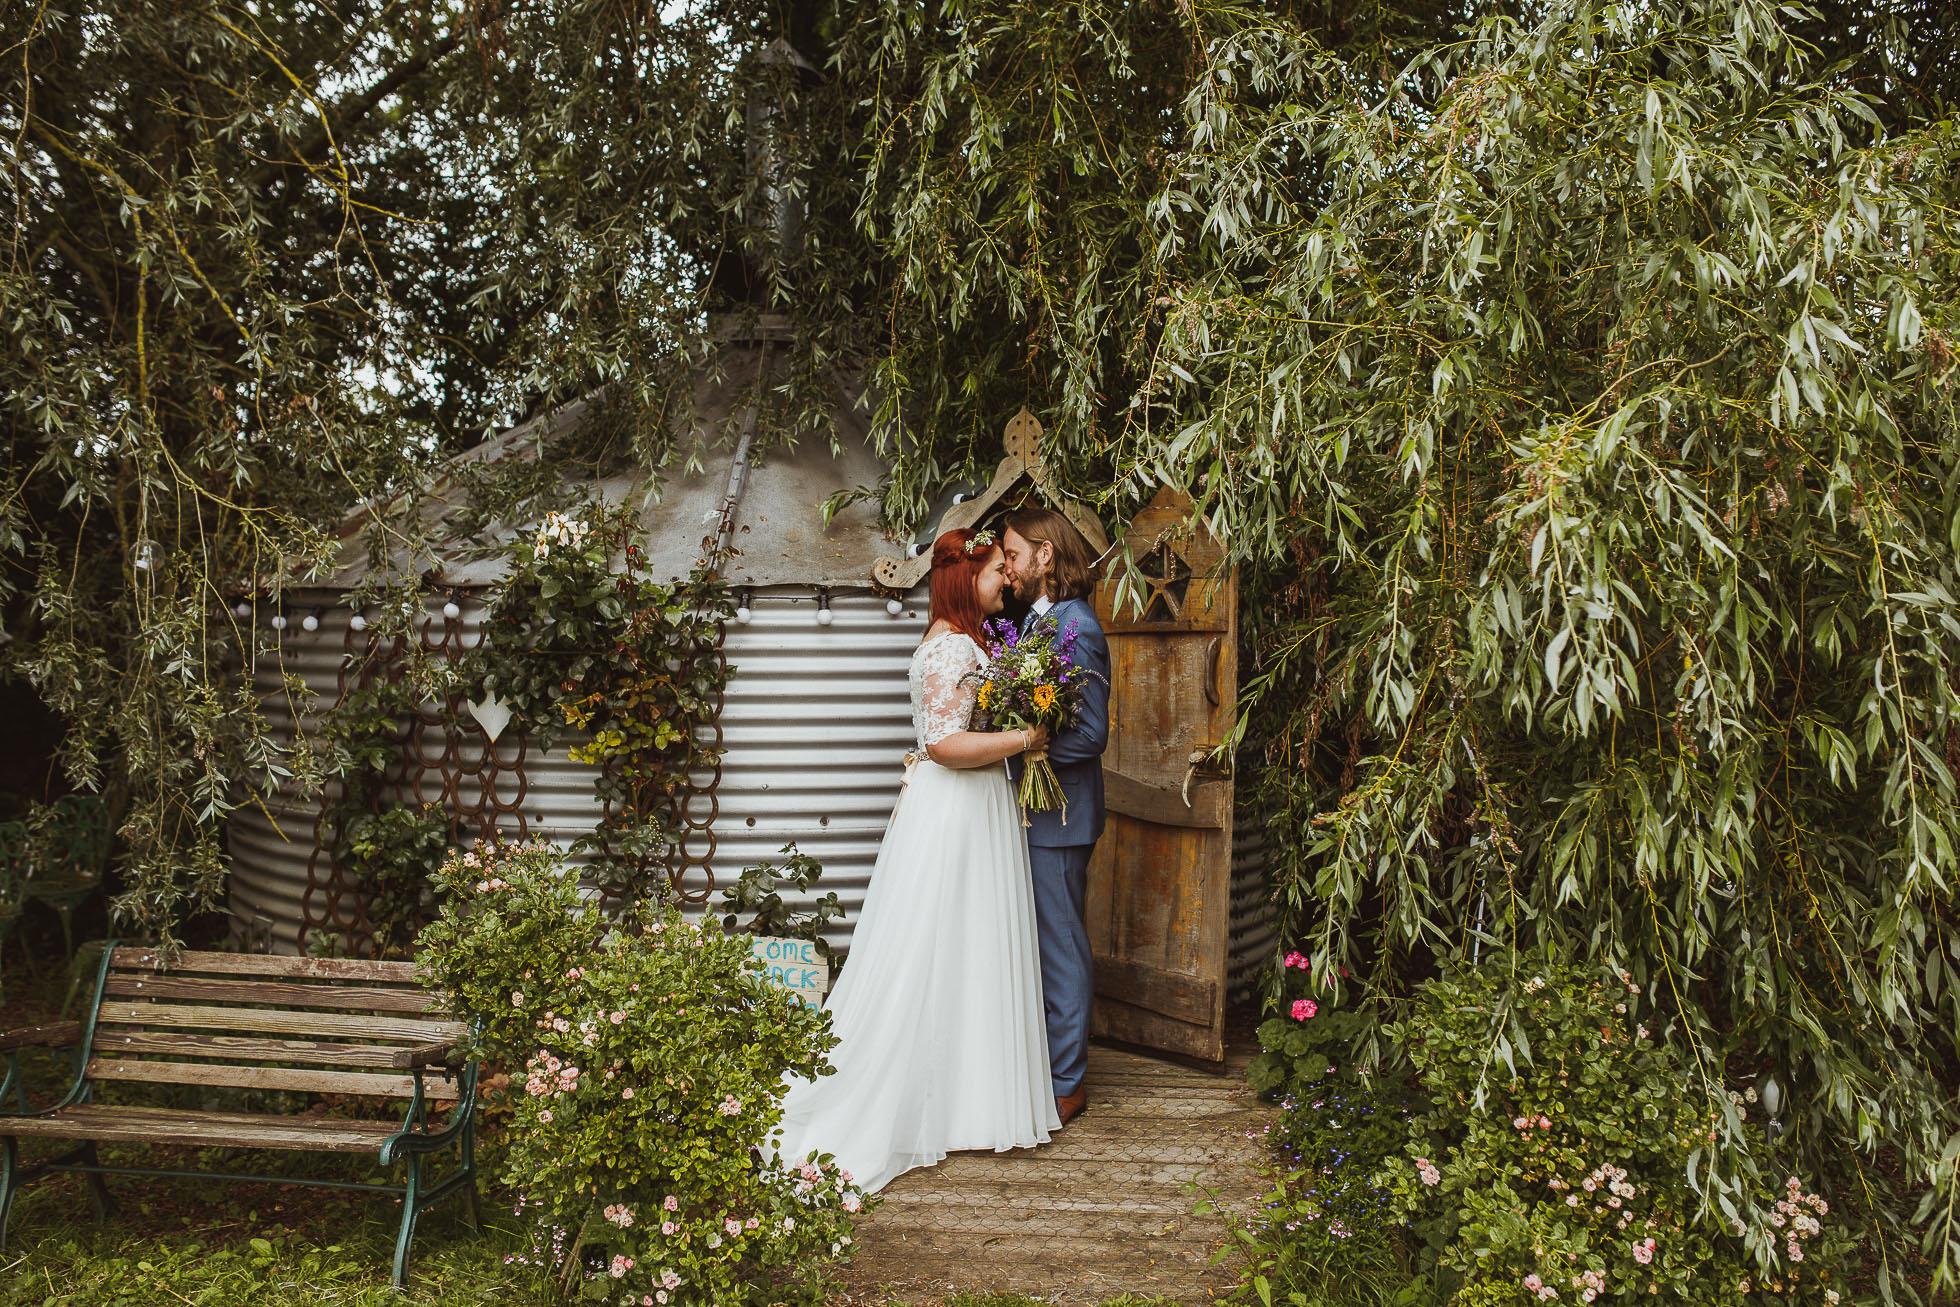 skipbridge_farm_wedding_york-70.jpg